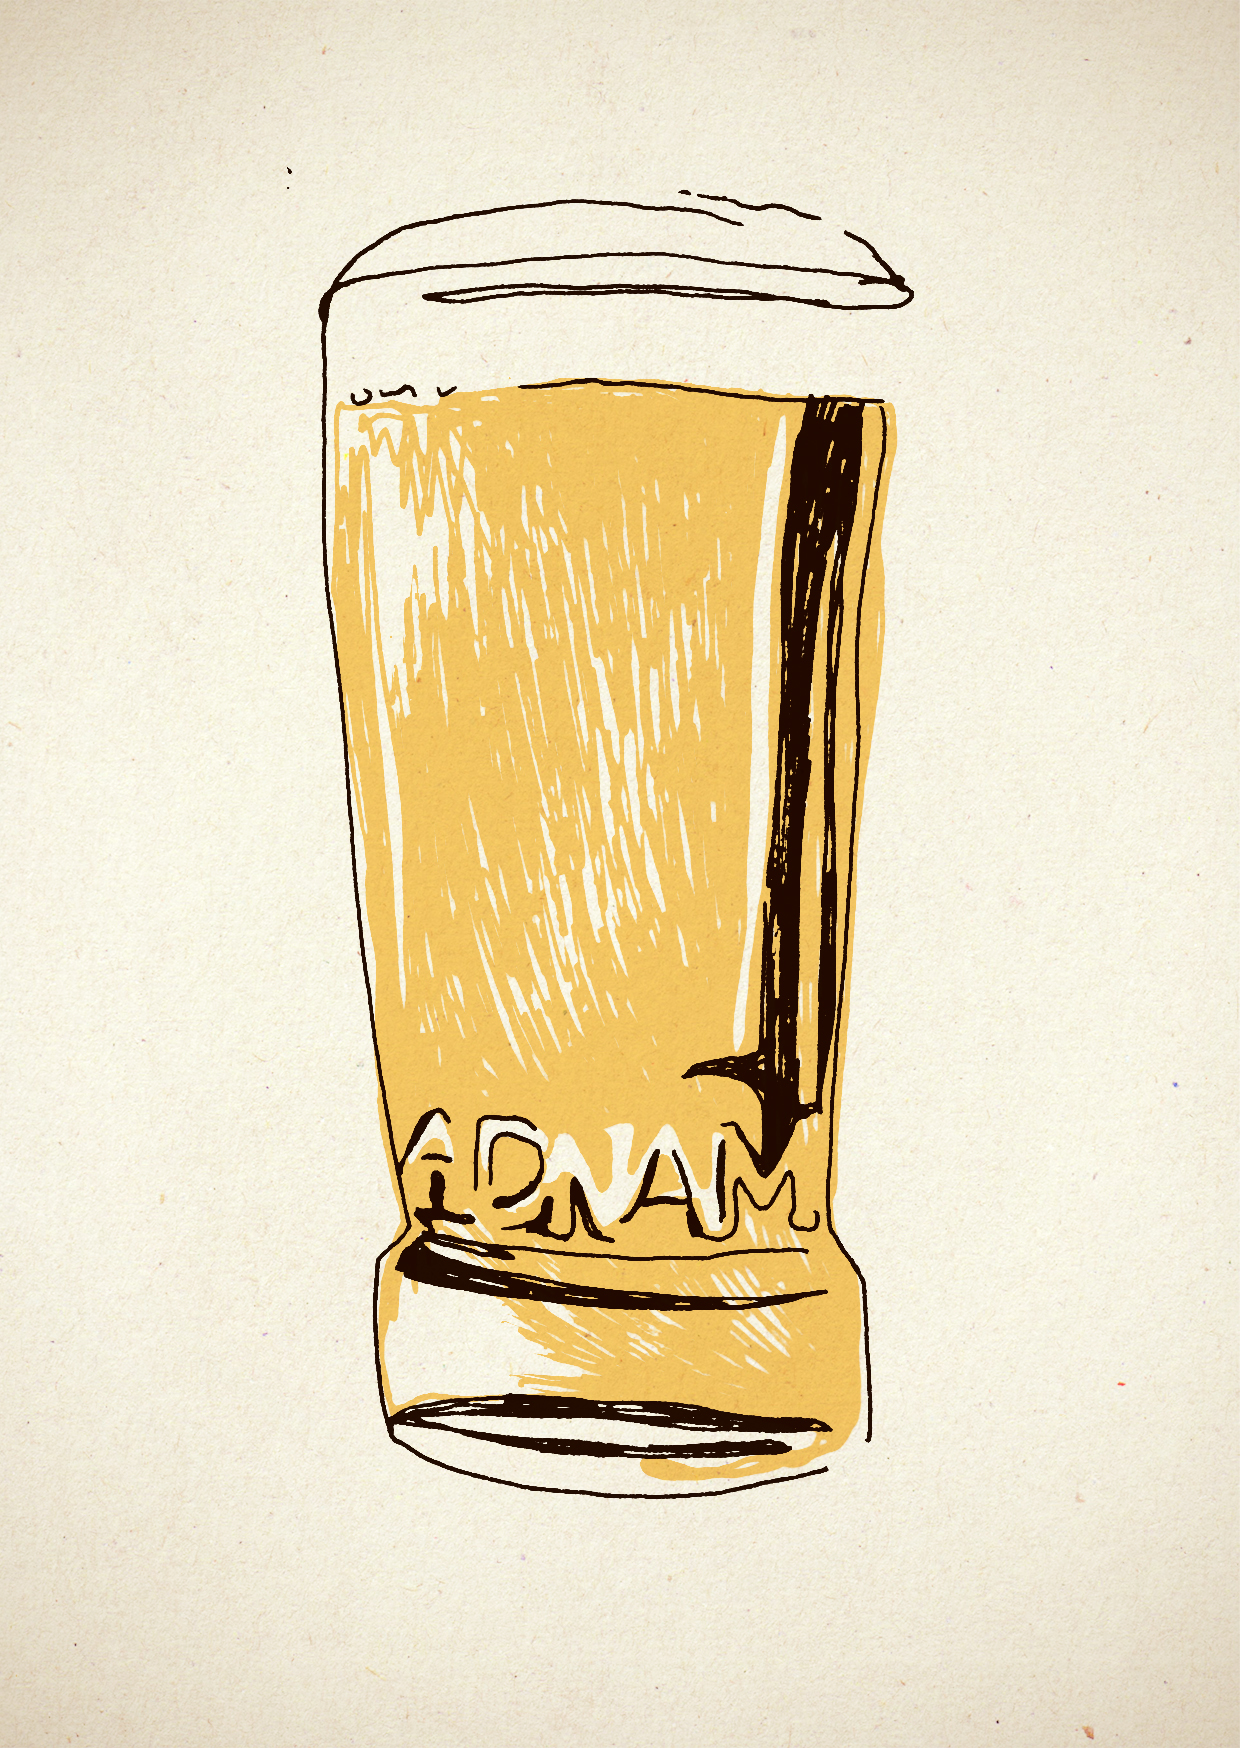 adnams_glass_a6